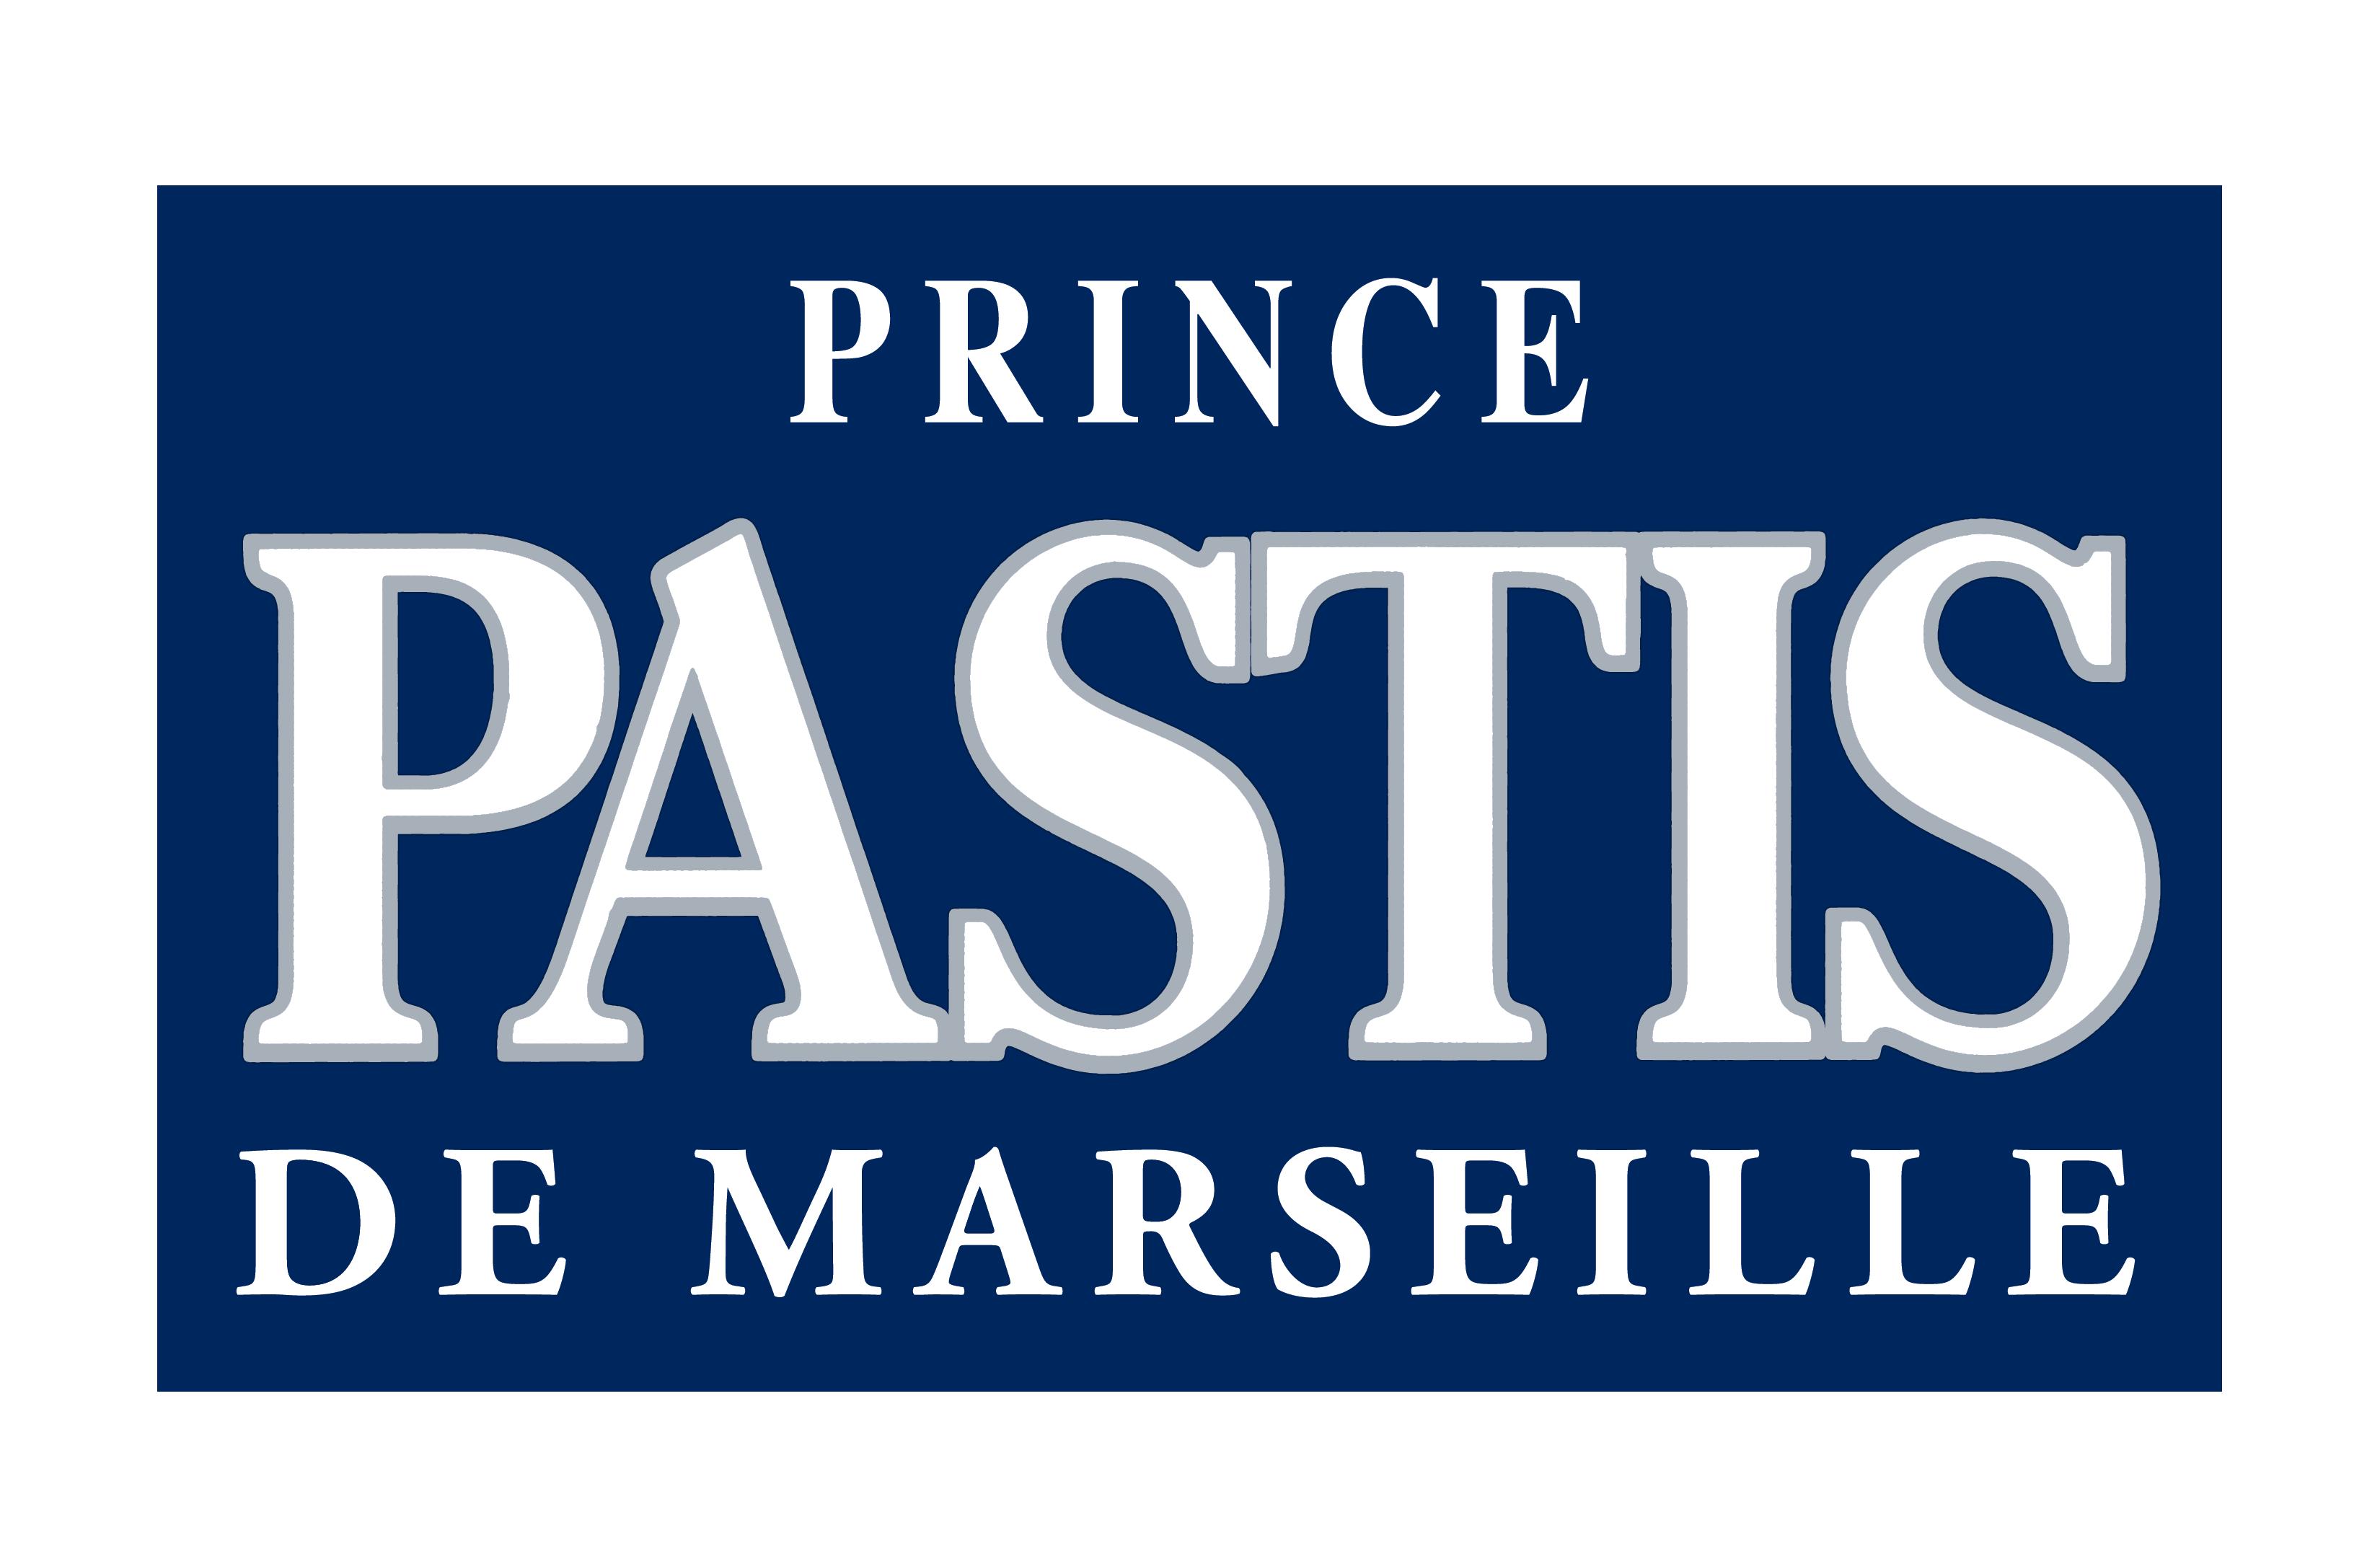 Prince Pastis de Marseille